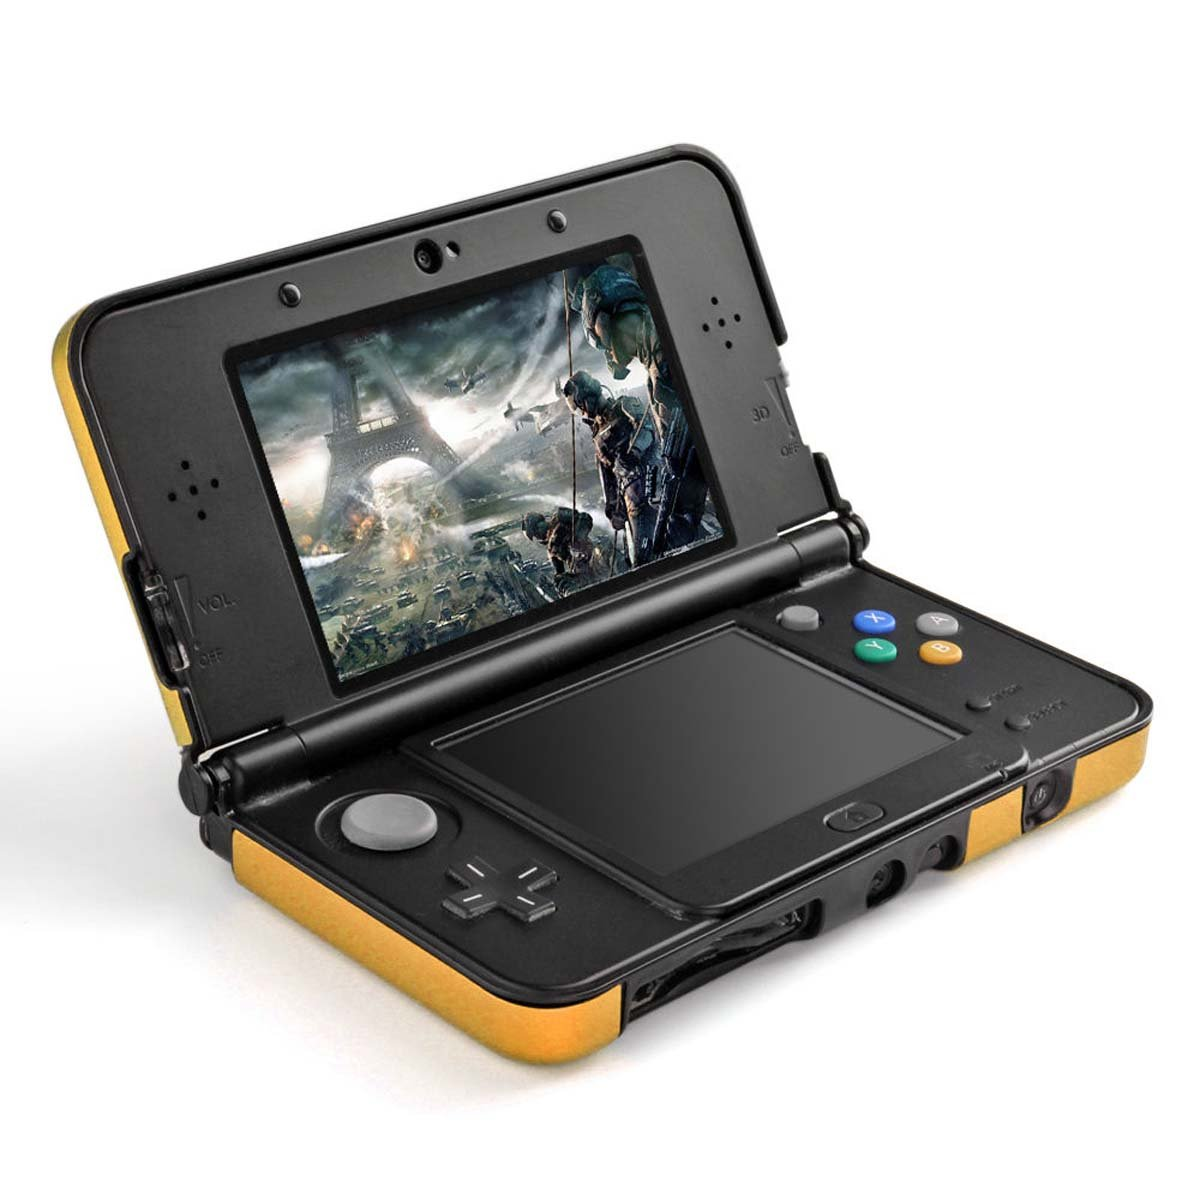 Chinatera carcasa rígida protectora carcasa de aluminio para New Nintendo 3DS LL XL